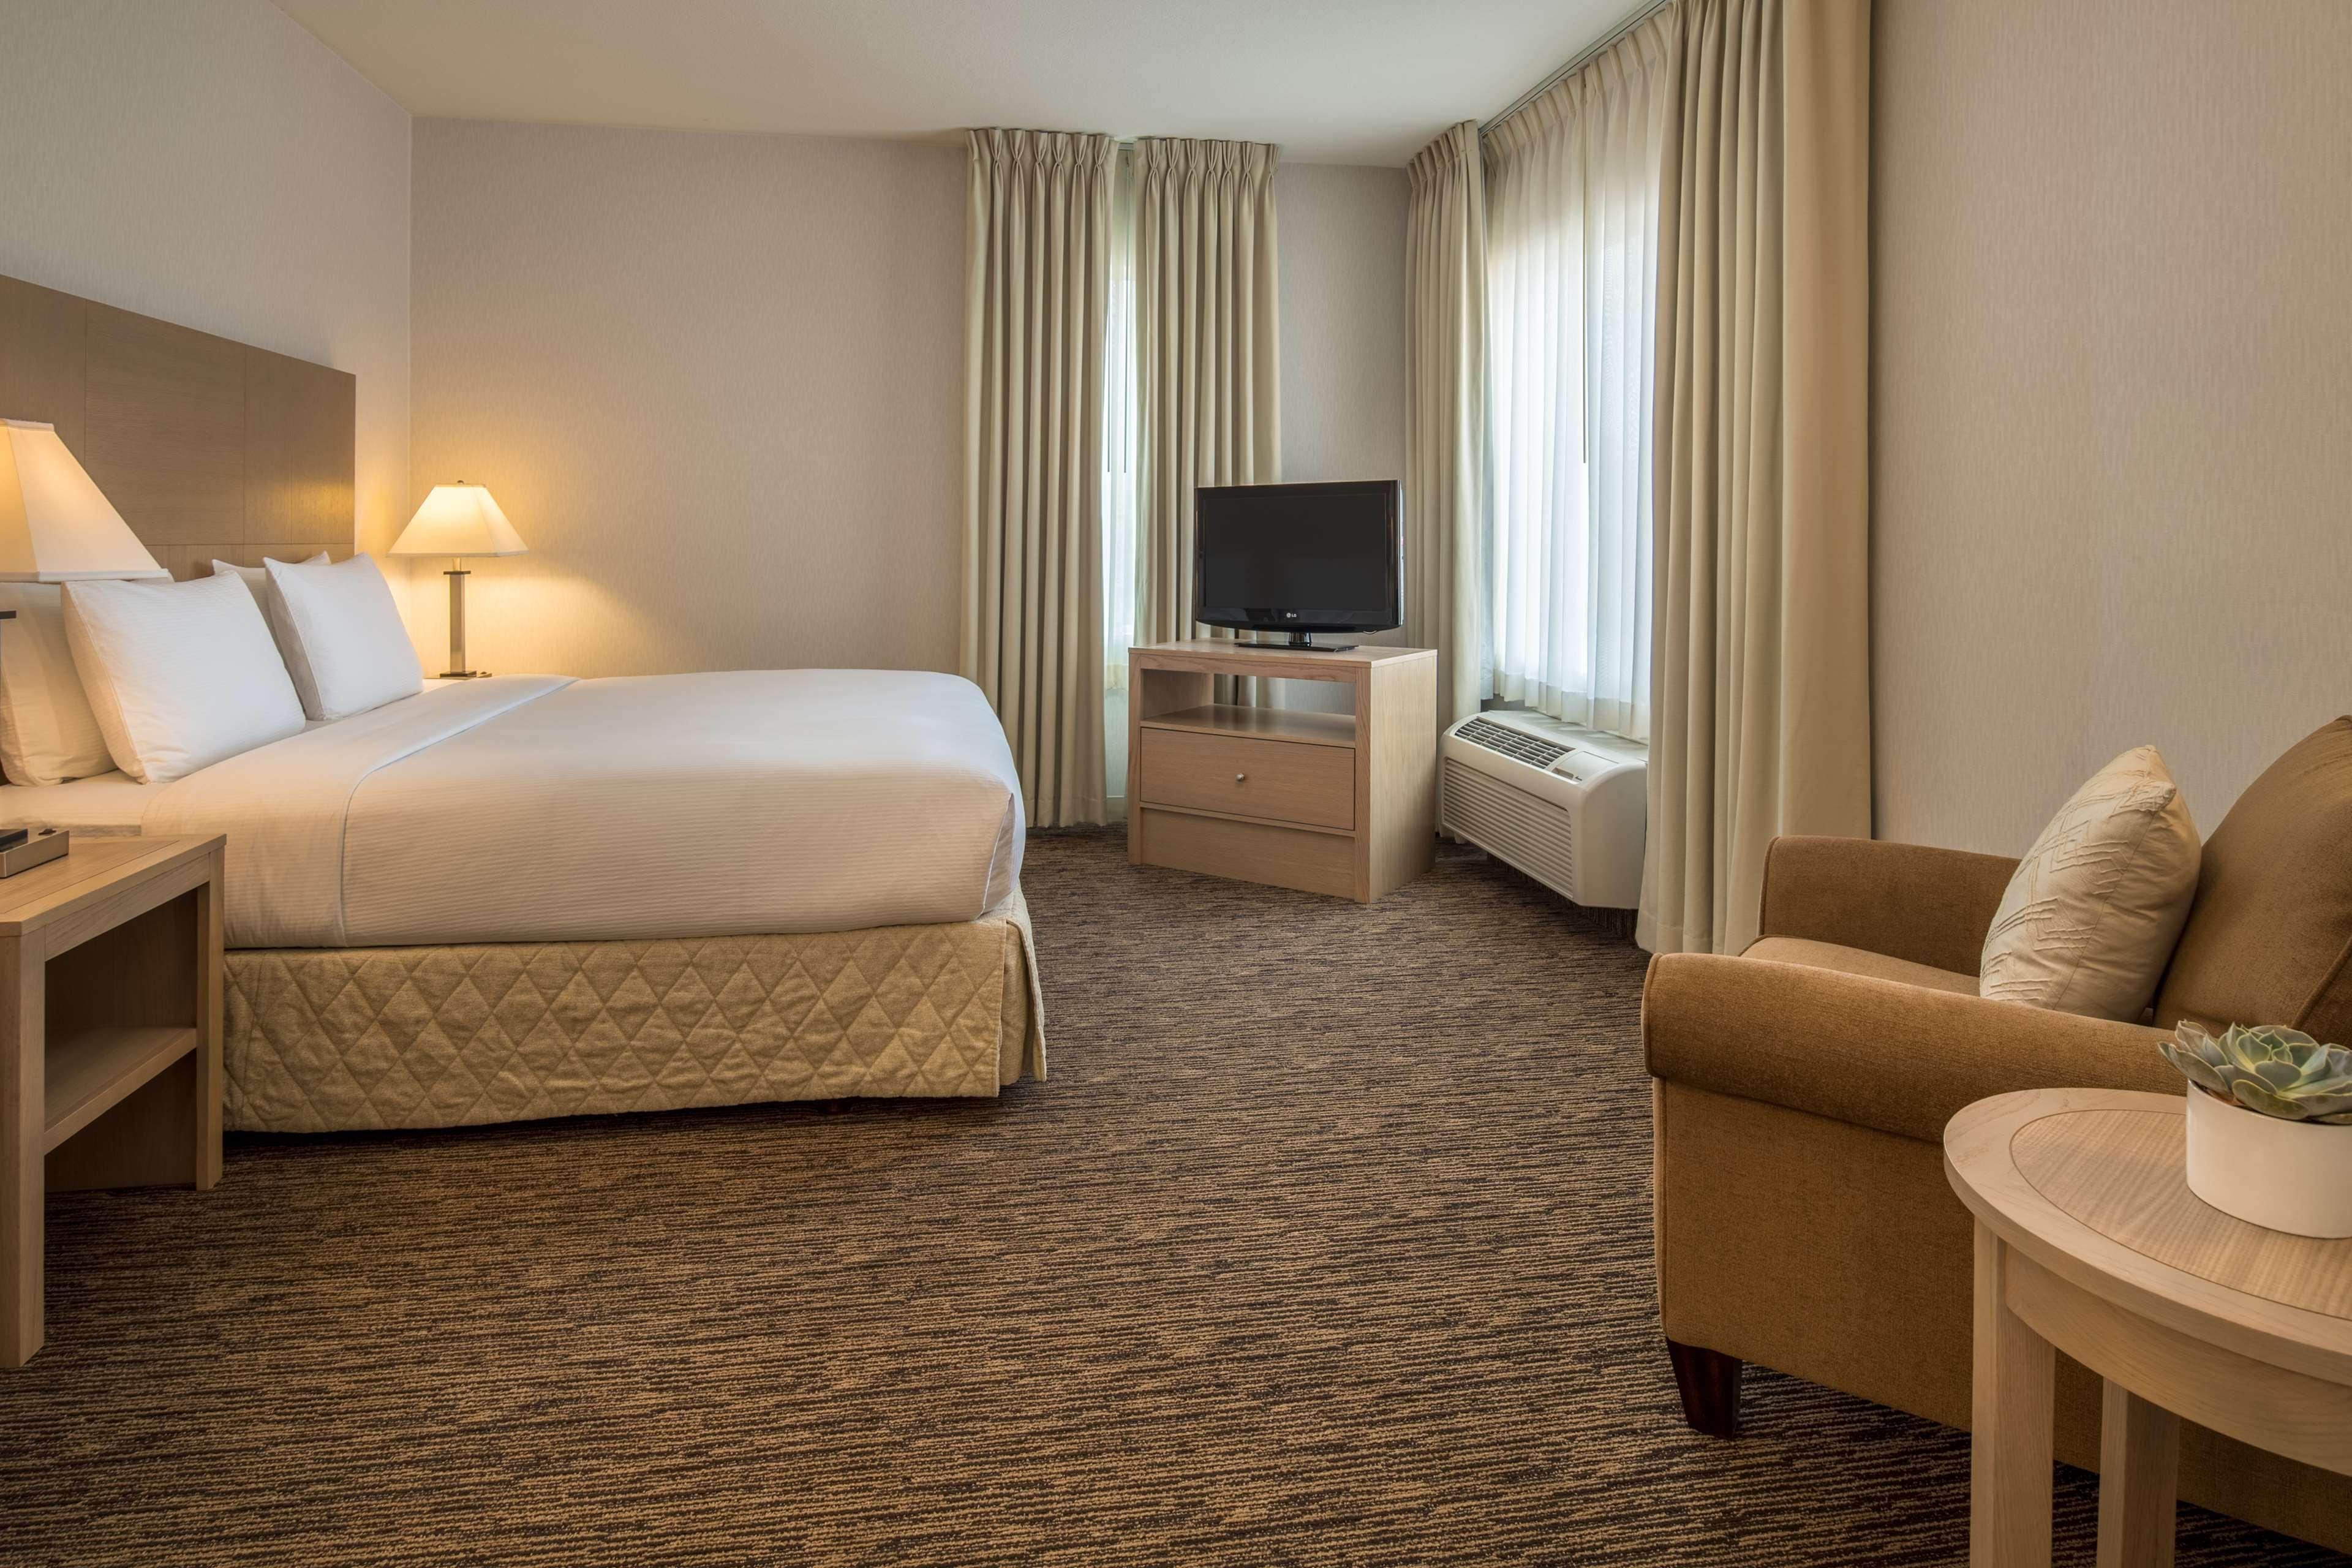 DoubleTree by Hilton Hotel Vancouver, Washington image 13